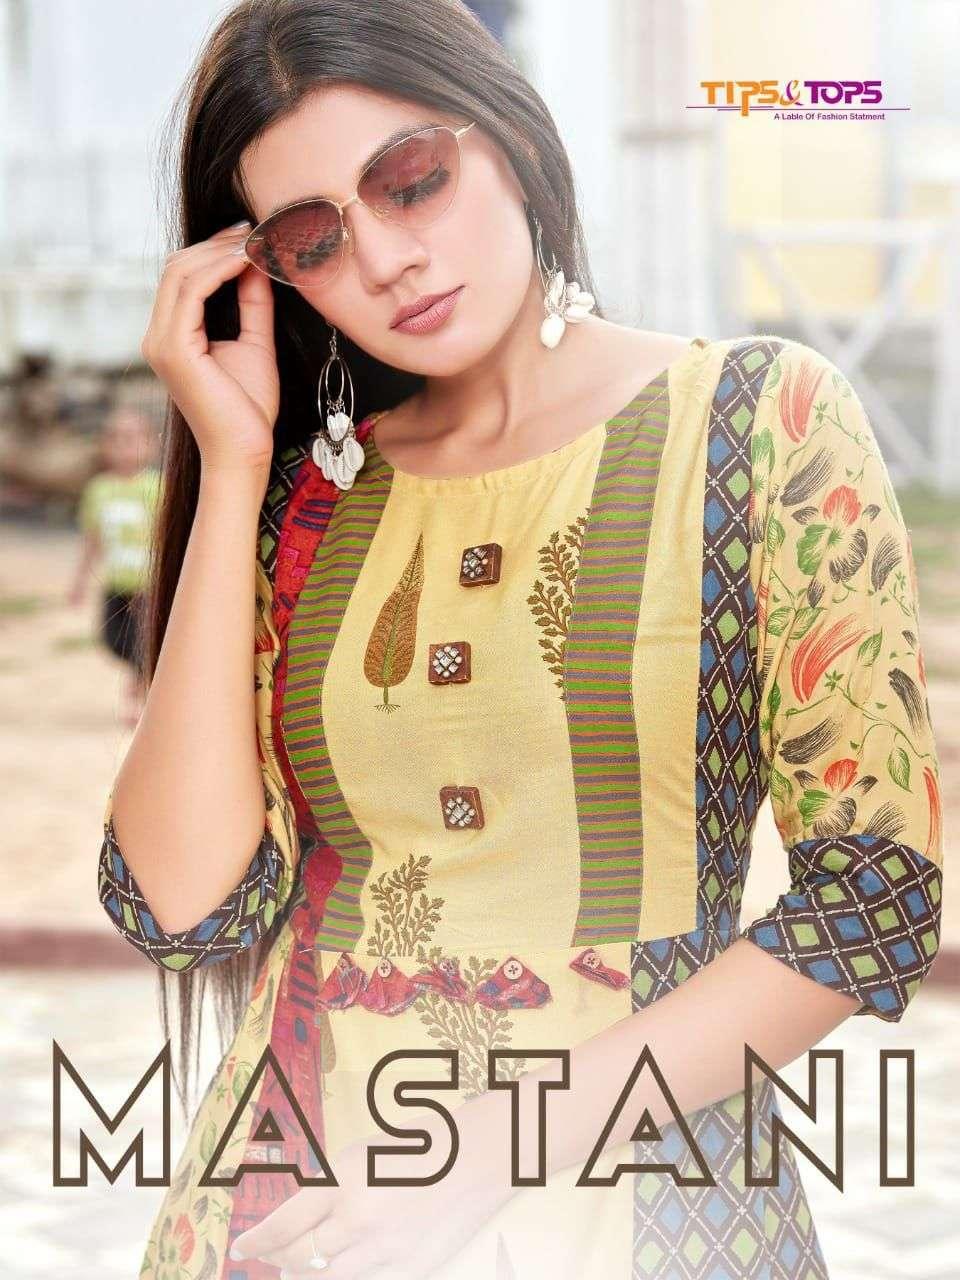 tips & tops mastani Heavy Rayon Print 16kg Ajarak and foil Print kurti